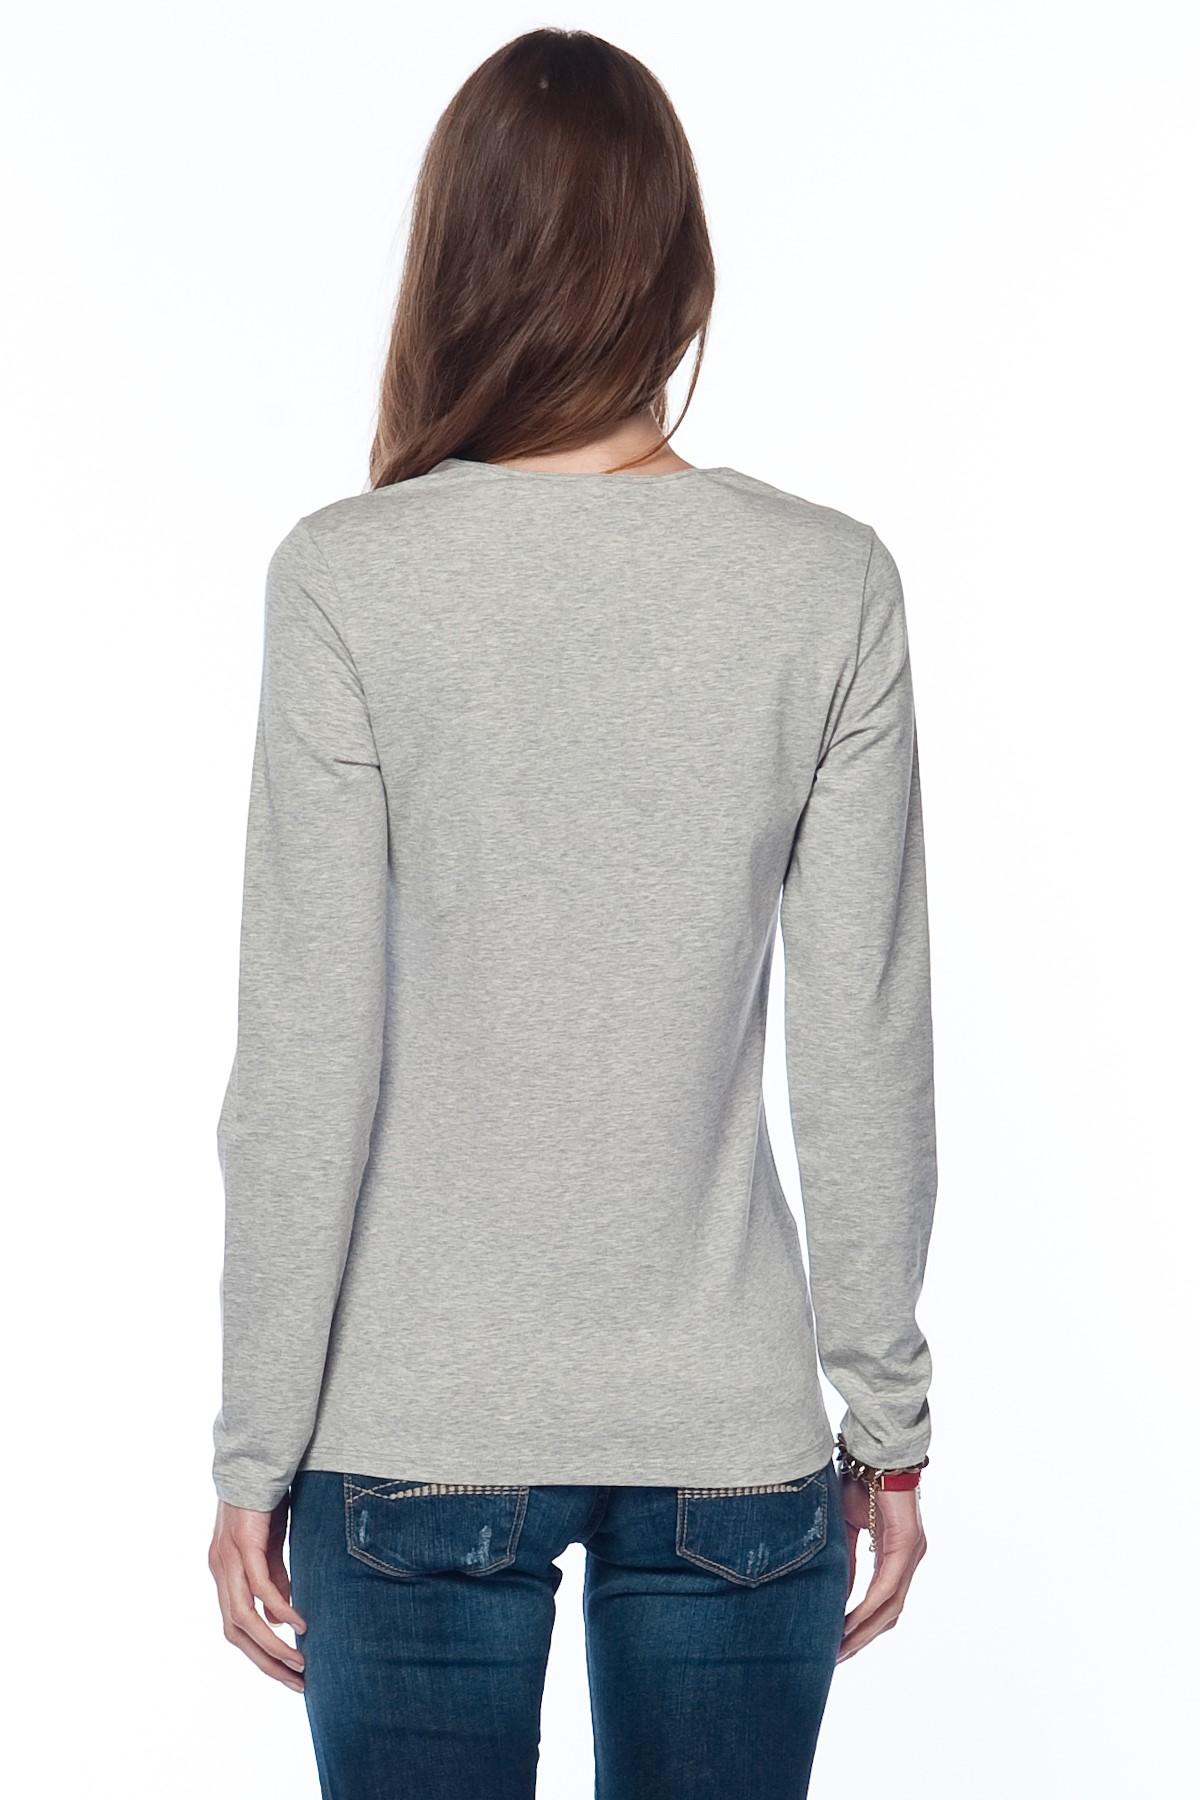 Tommy Hilfiger Gri Kadın Sweatshirt 1M87603734-002 2